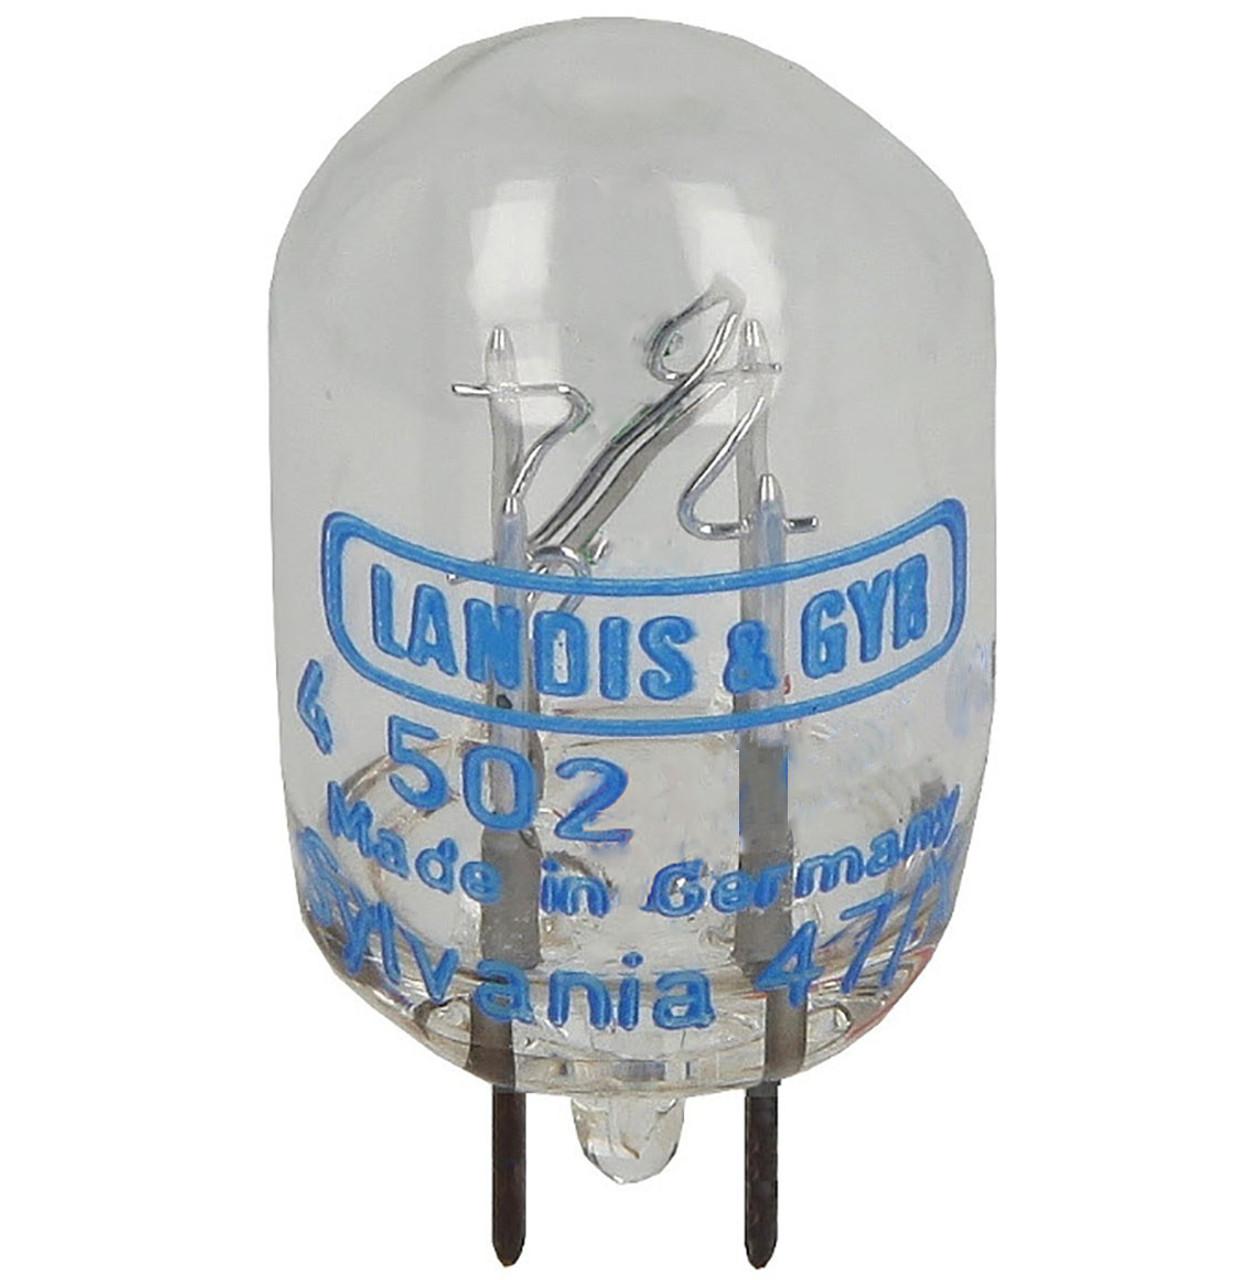 Siemens AGR450240650 UV replacement cell, for QRA2M/QRA2M(1)/QRA10M.C/QRA51M/QRA53/QRA55